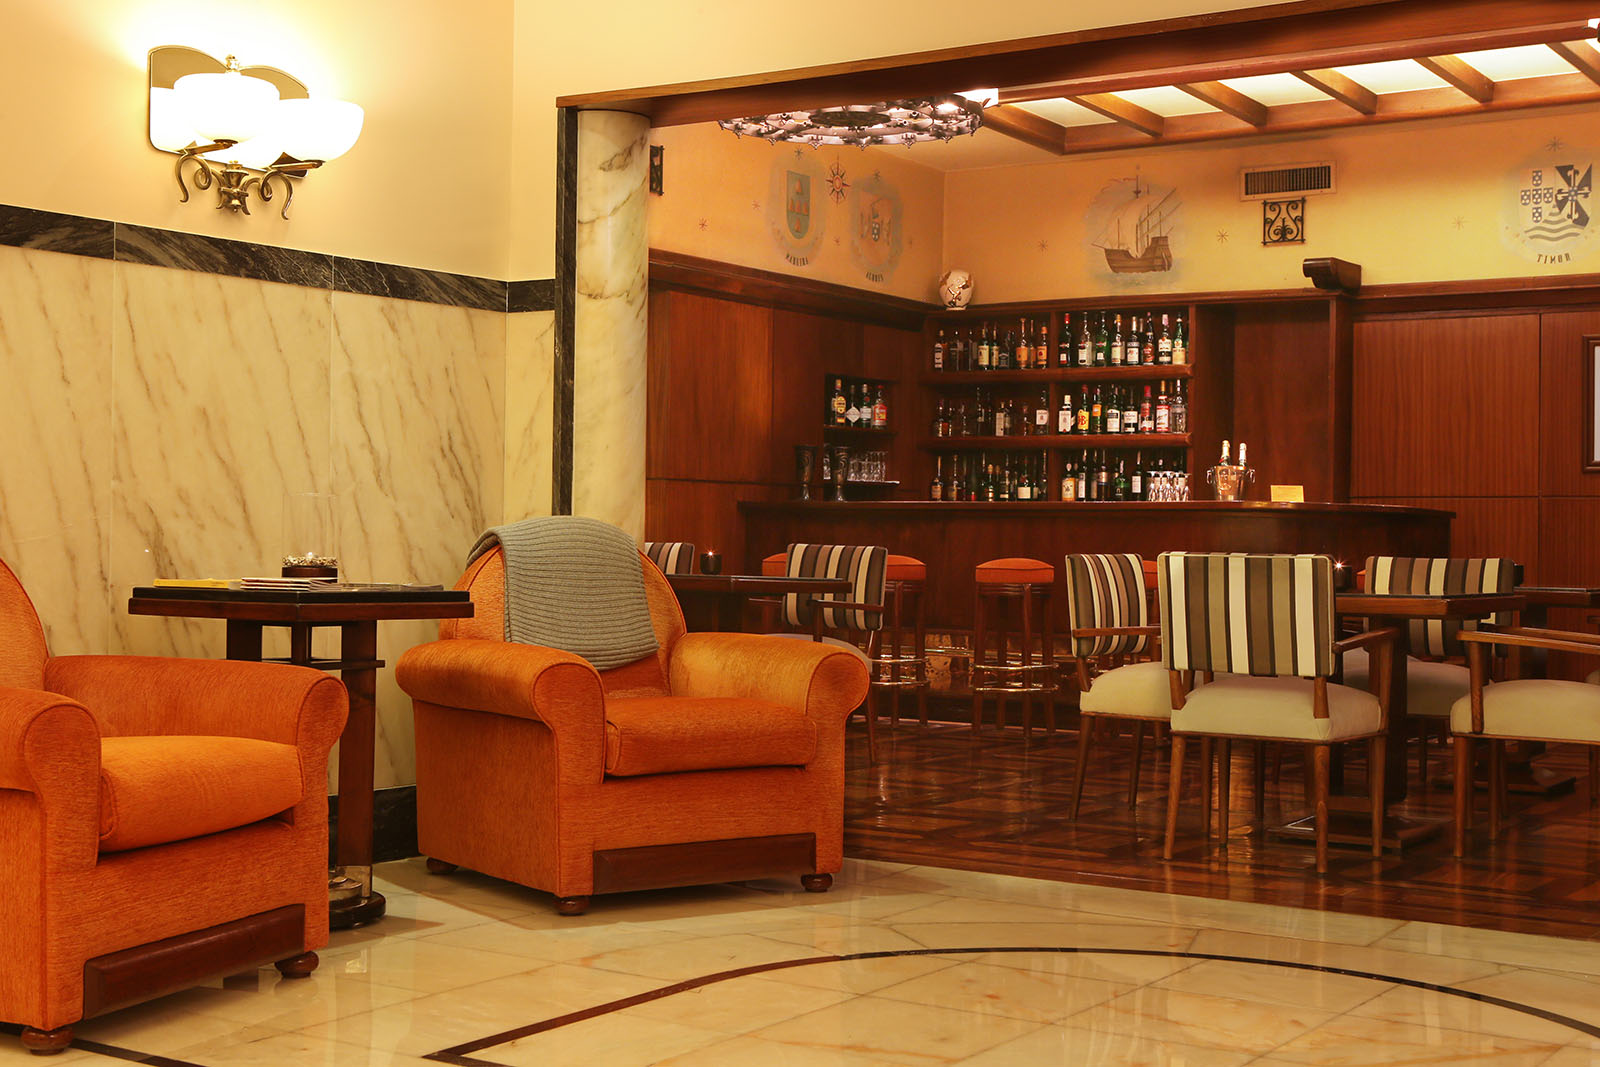 Hotel Britania, a fabulous Art Deco hotel